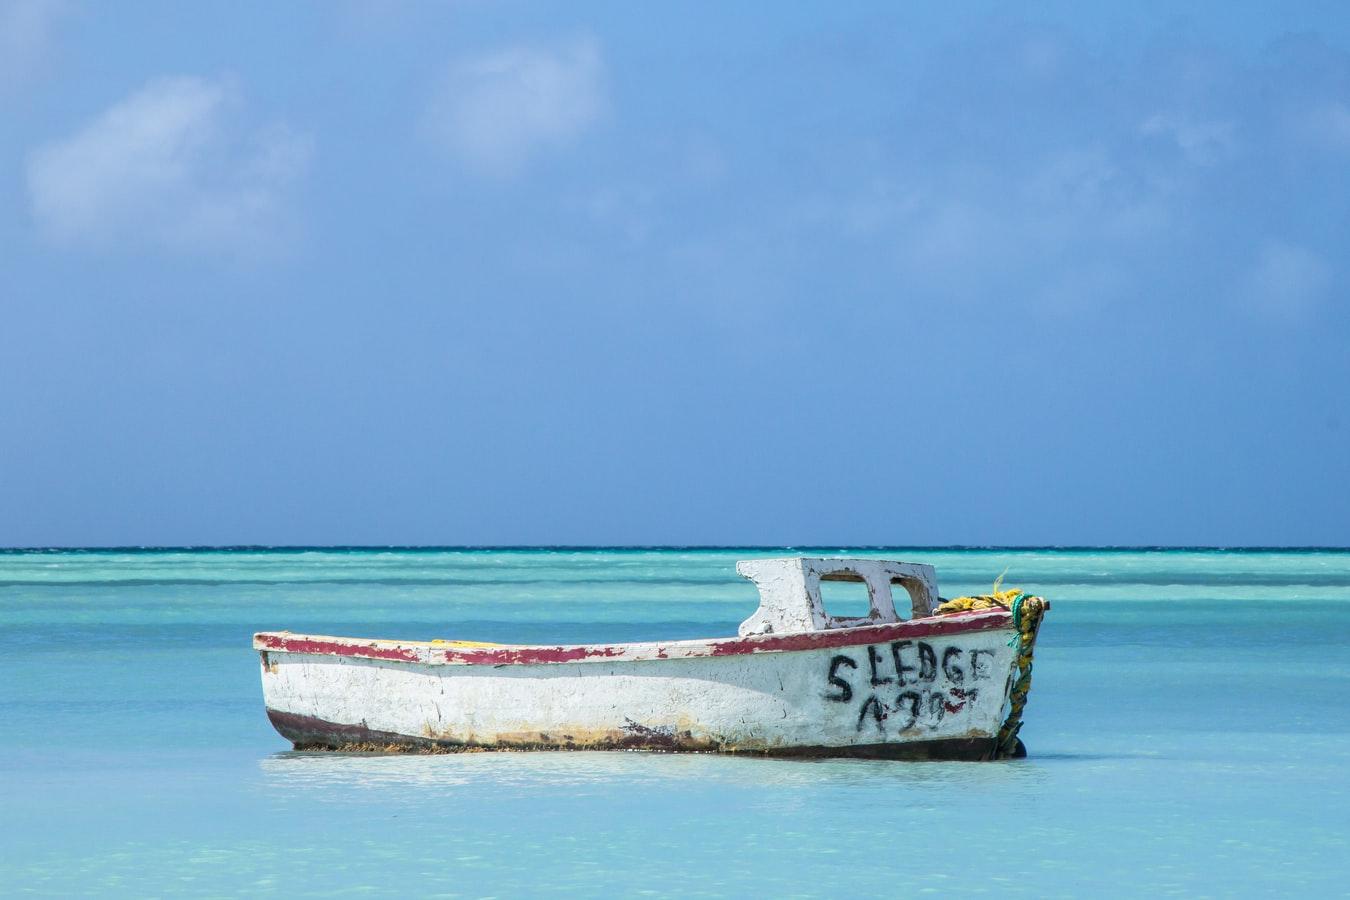 Aruba, Carribean